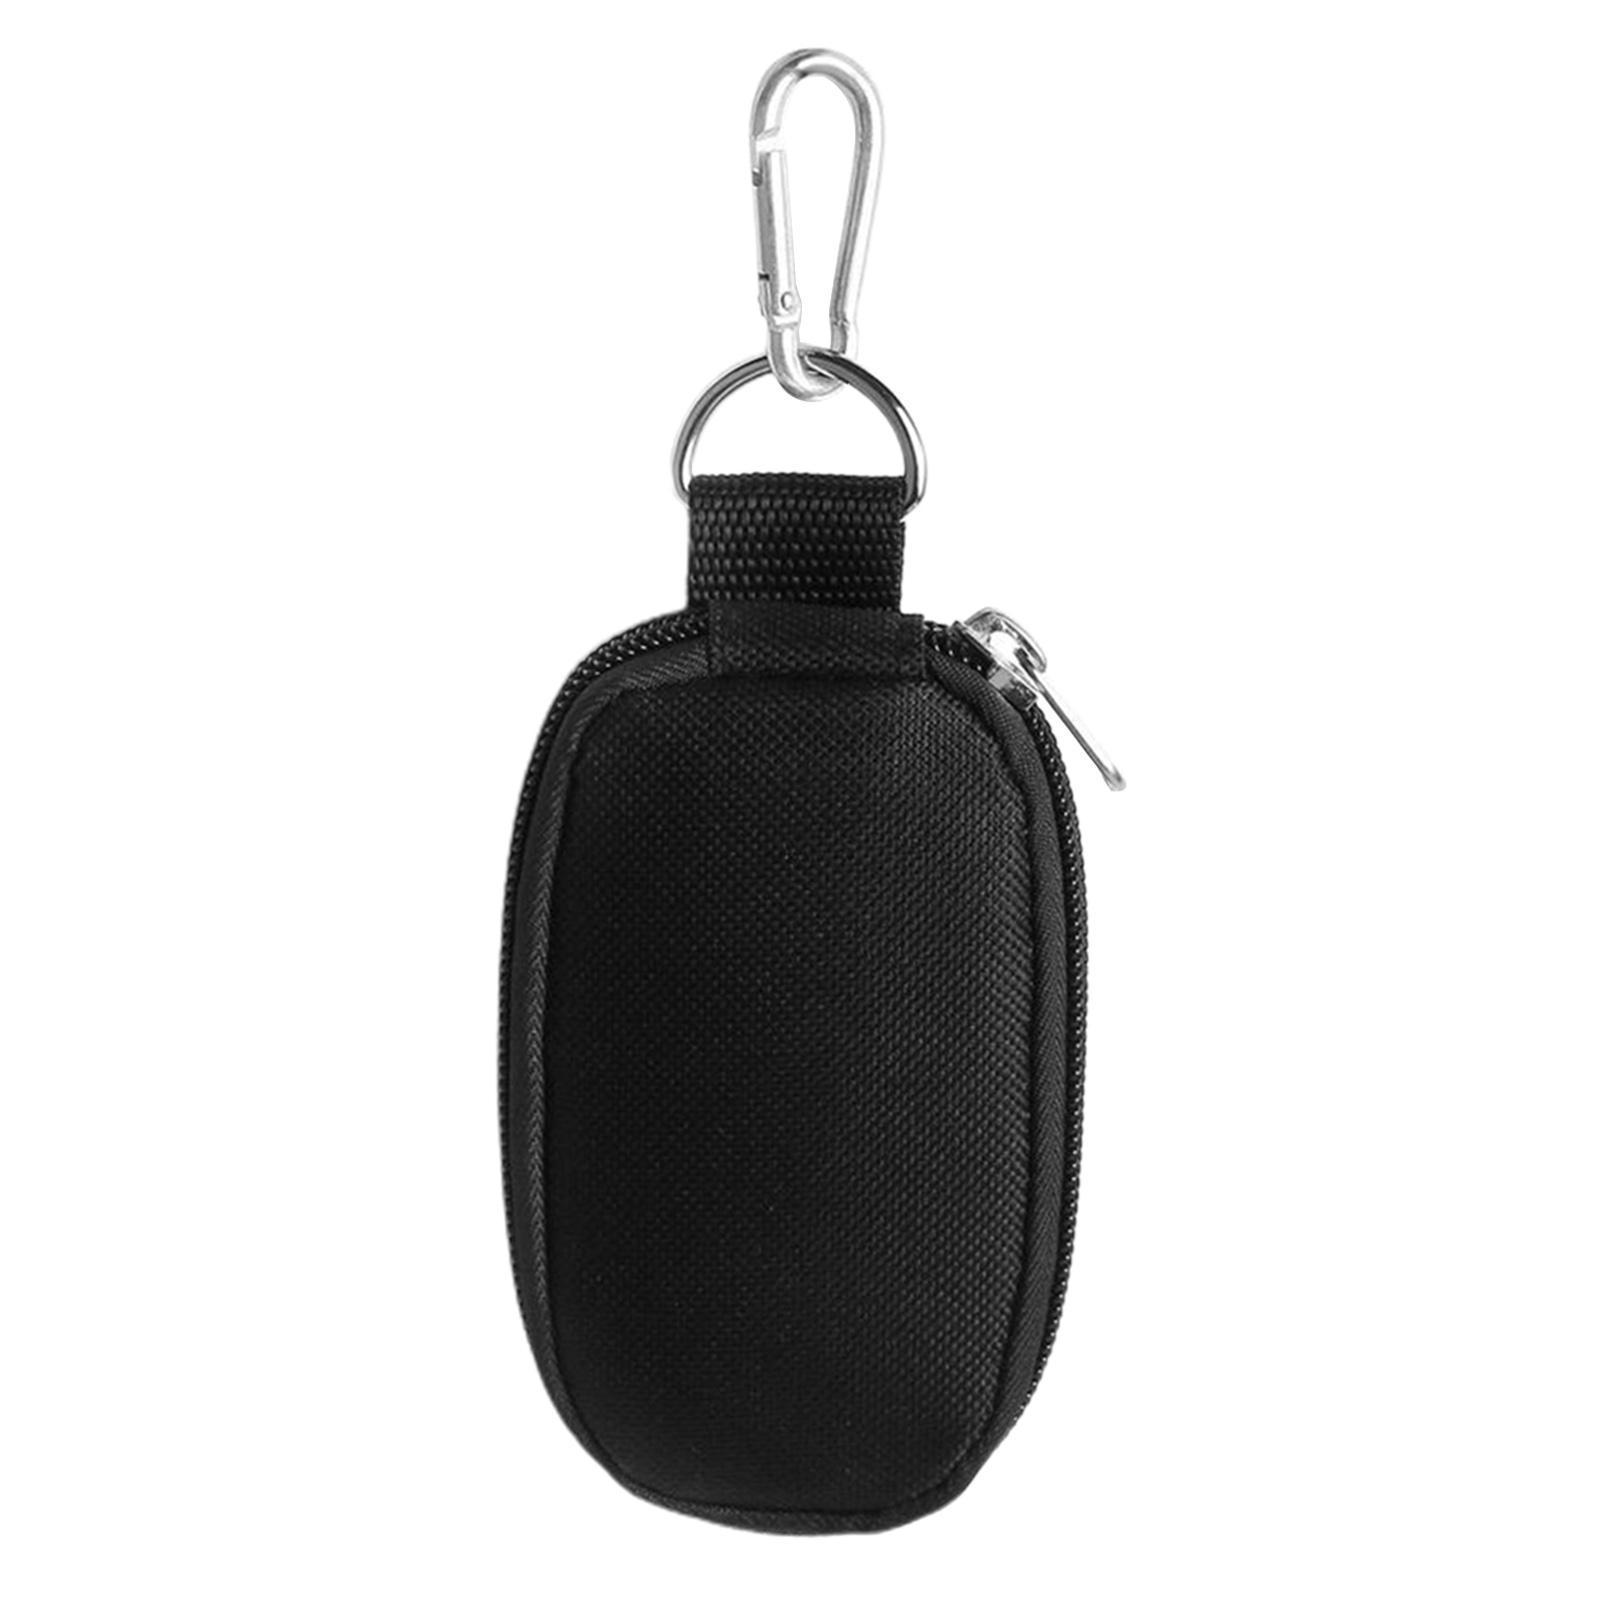 Custodia-protettiva-antiurto-per-custodia-antiurto-da-2-ml-10-bottiglie miniatura 15